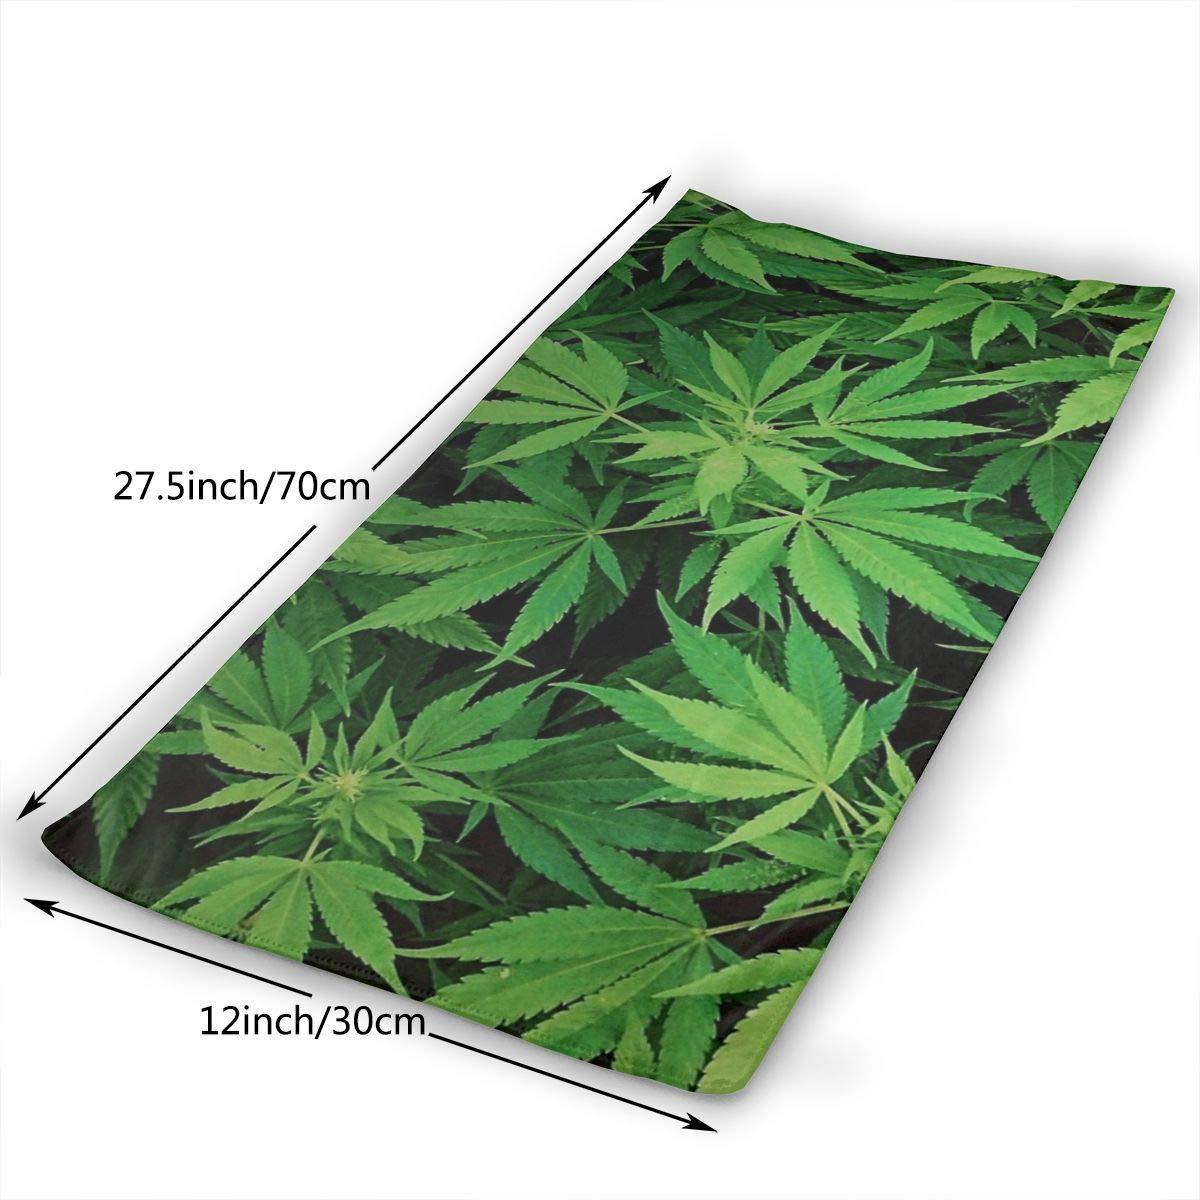 Toallas de mano grandes de microfibra (marihuana de hierba verde de cannabis - 12 x 27.5 pulgadas) - Toalla multiusos de secado rápido para baño, cara, ...